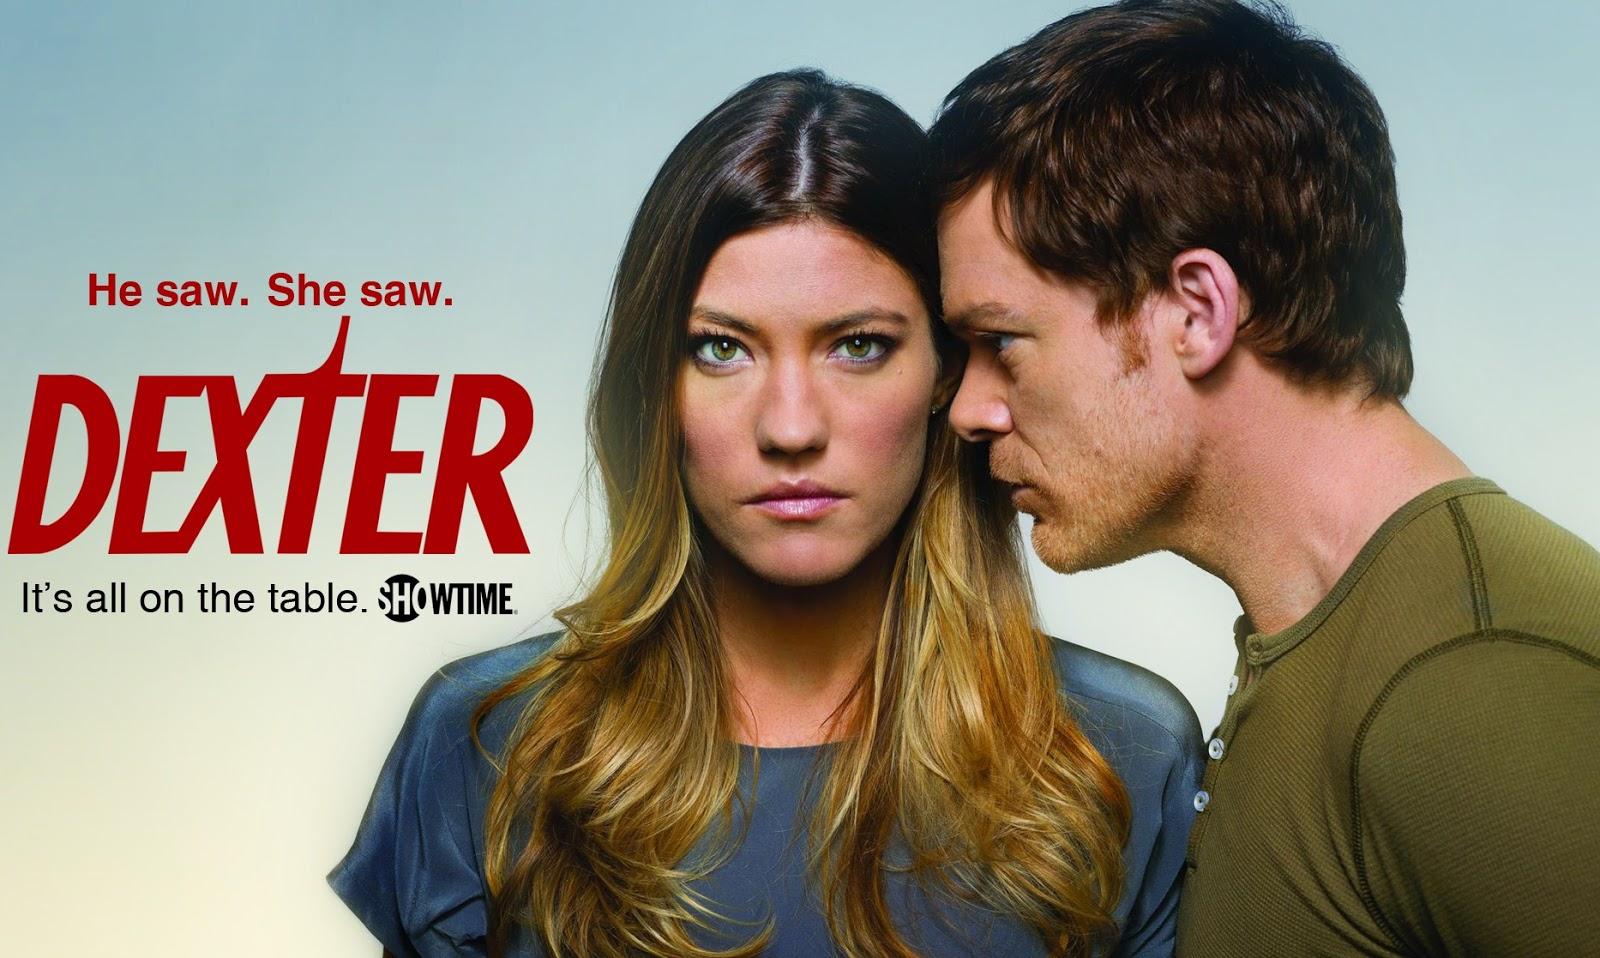 Dexter - Trailers de 8va temporada!